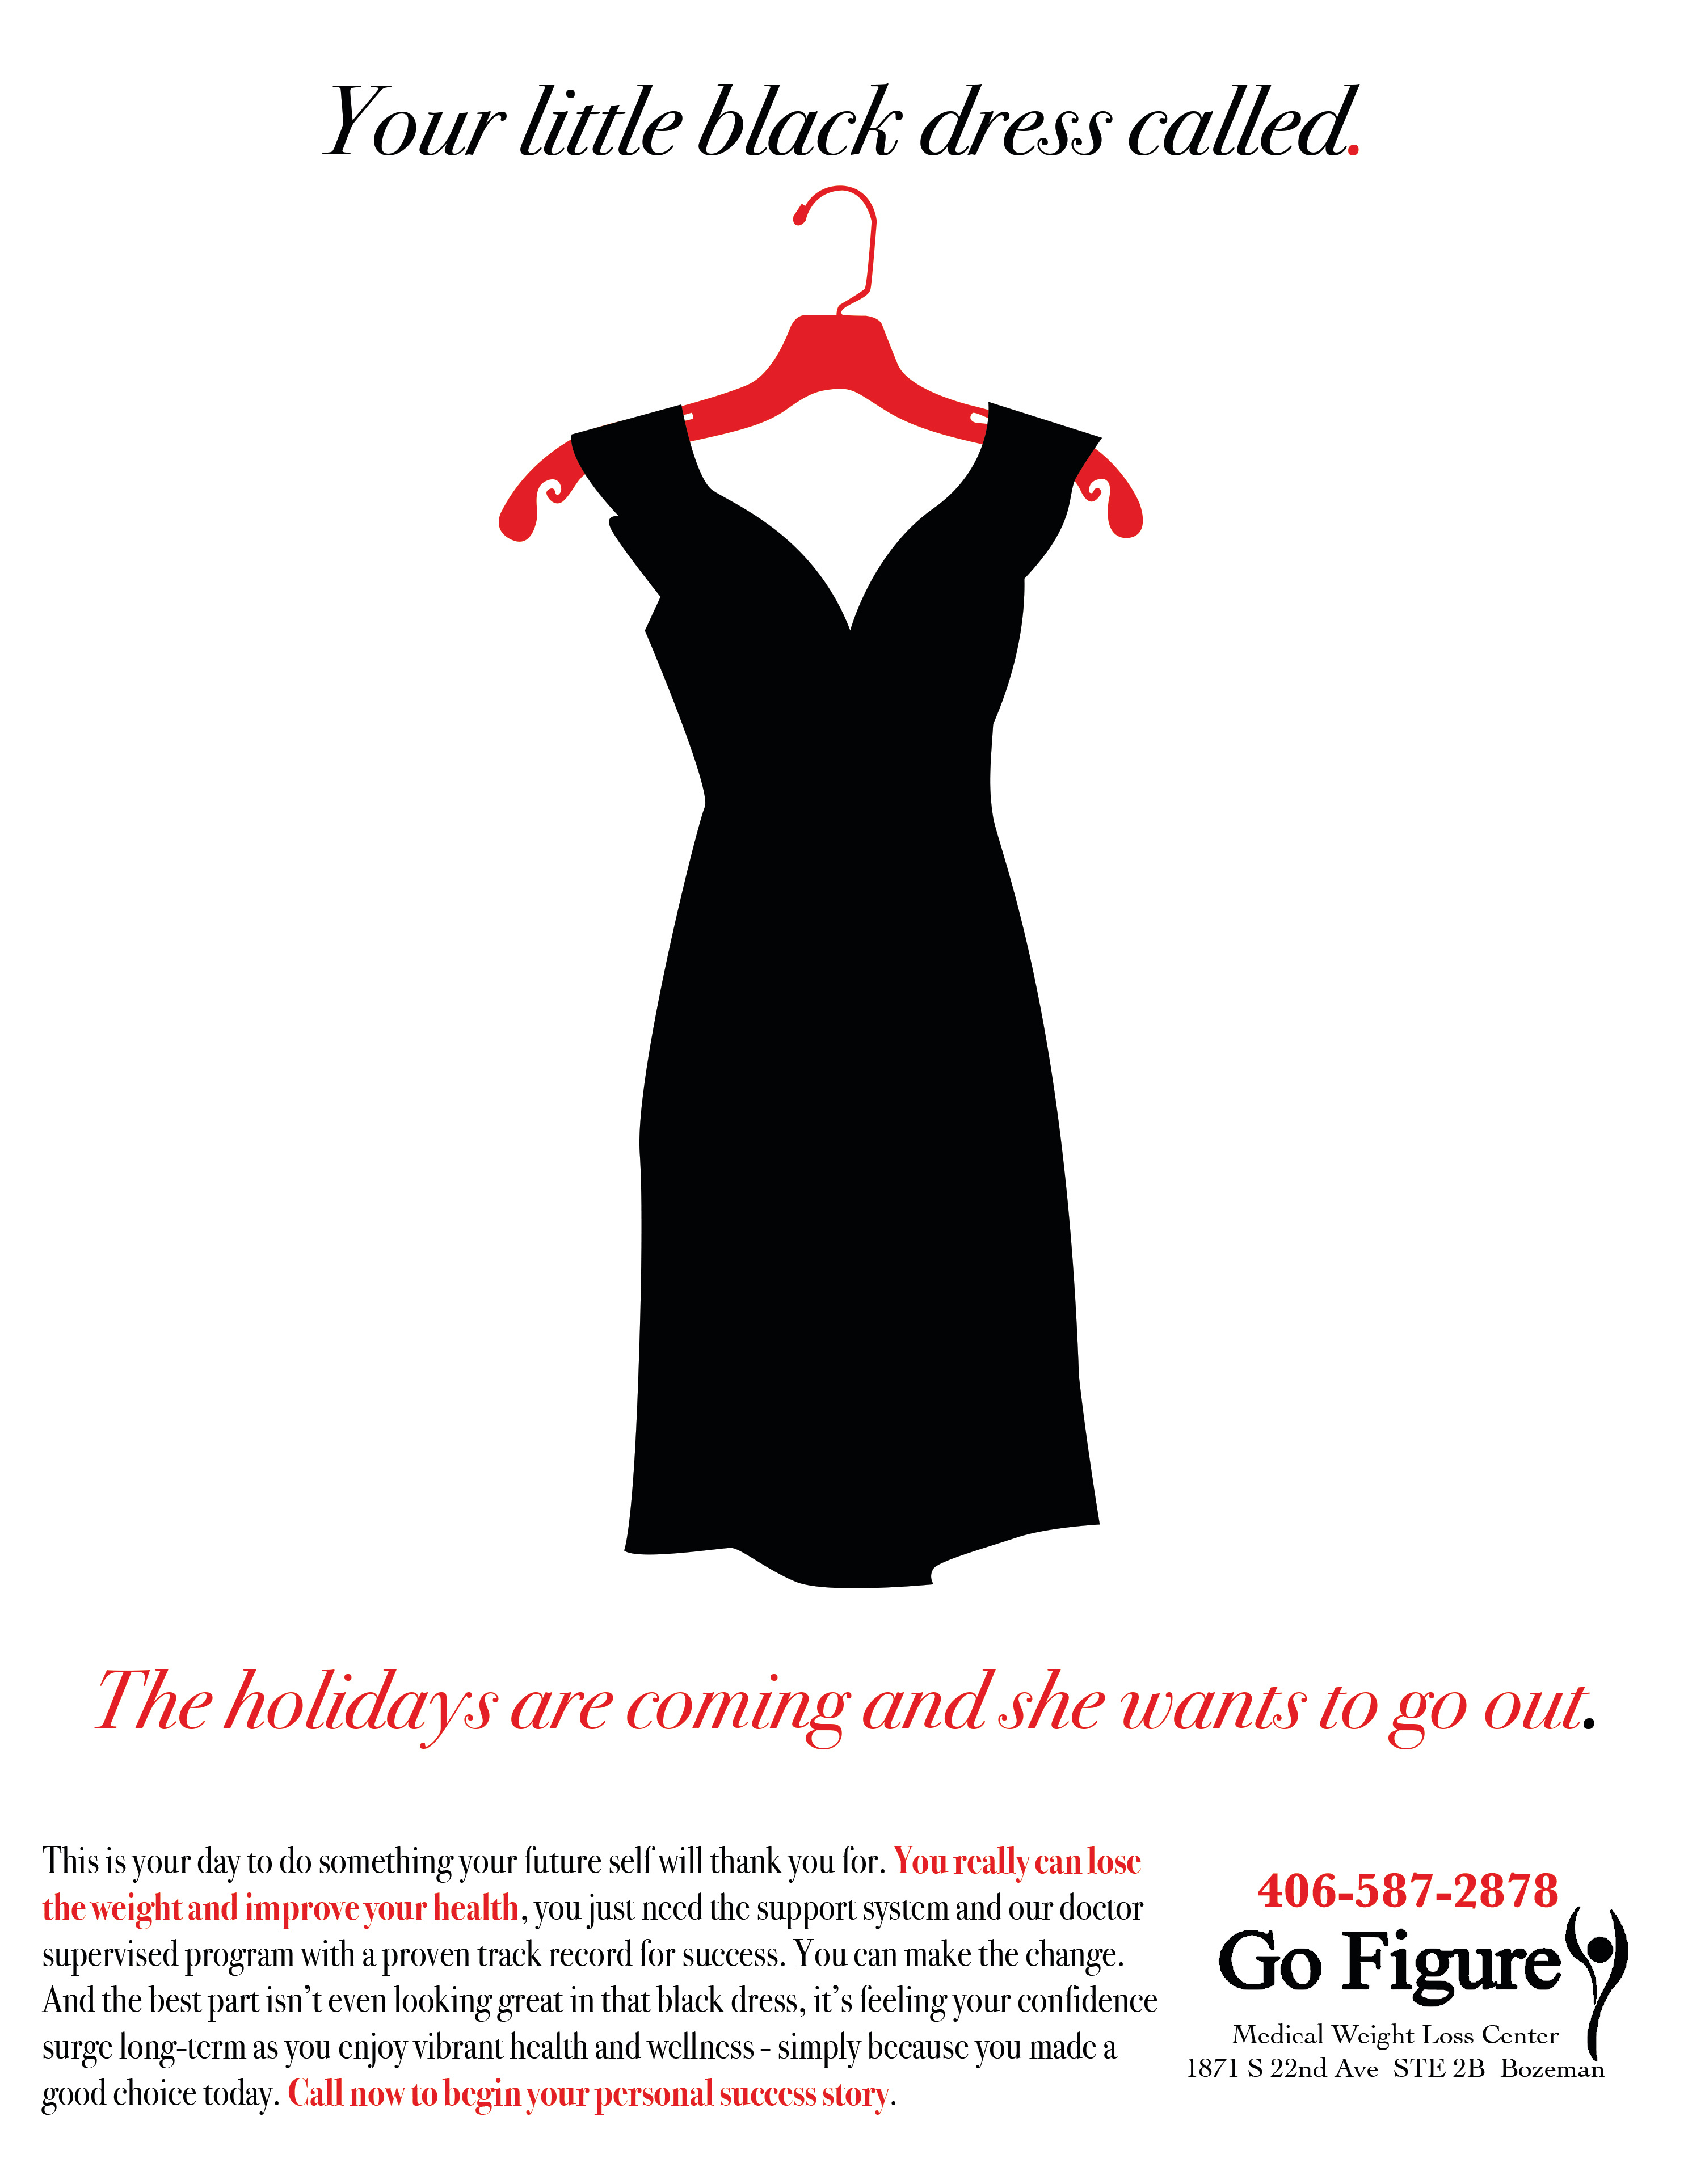 Go Figure Holiday Dress Ad